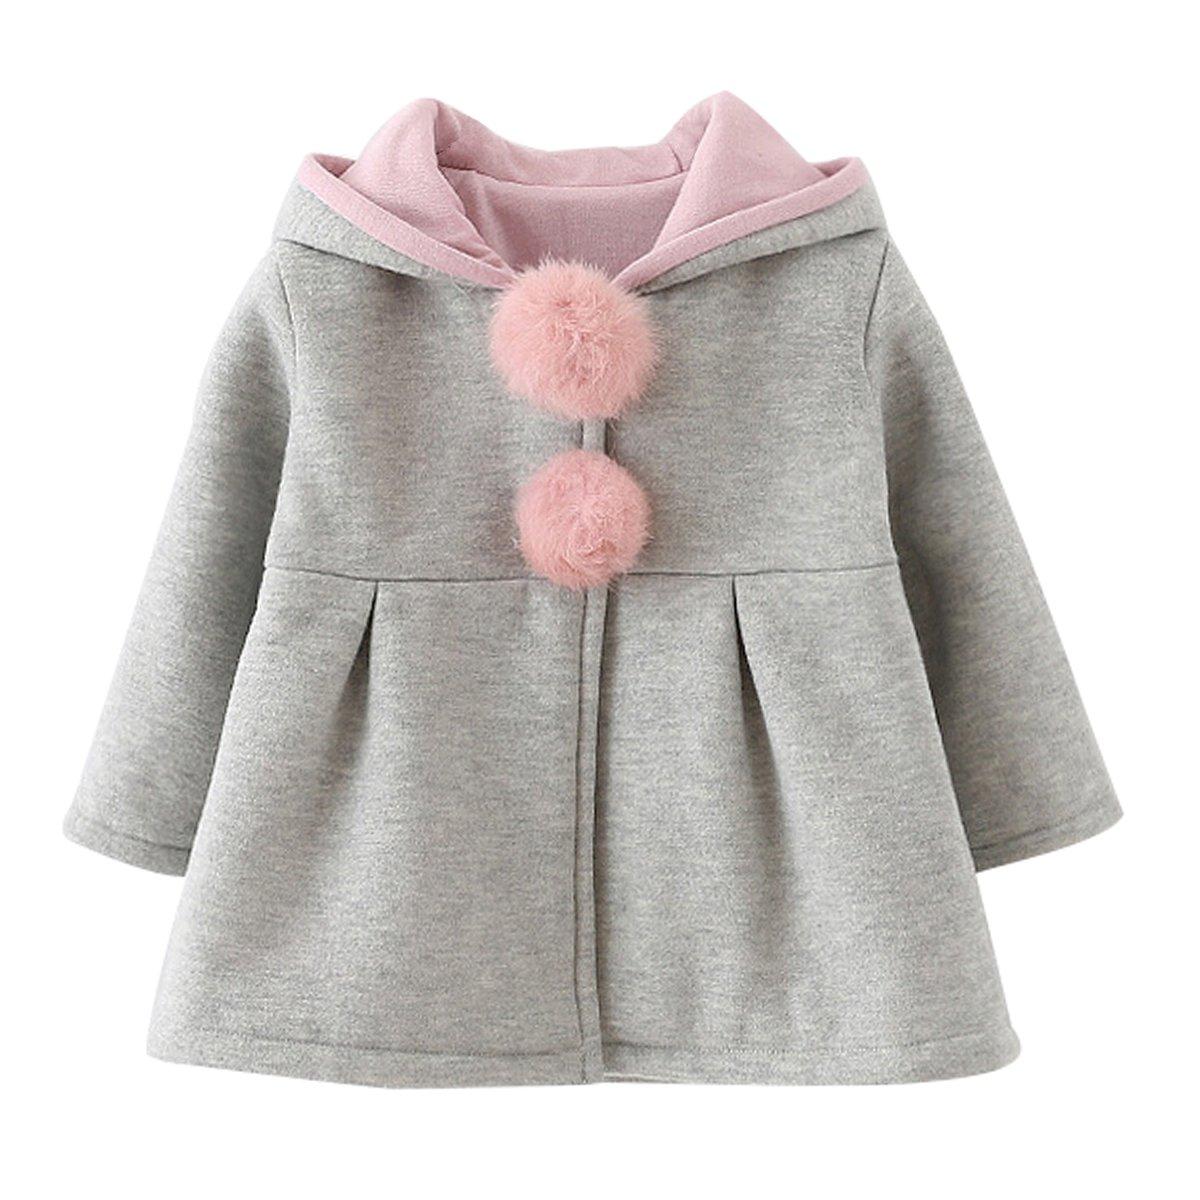 Evaliana Baby Girls Kids Toddlers Rabbit Bunny Ears Hoodie Outwear Jacket Coat